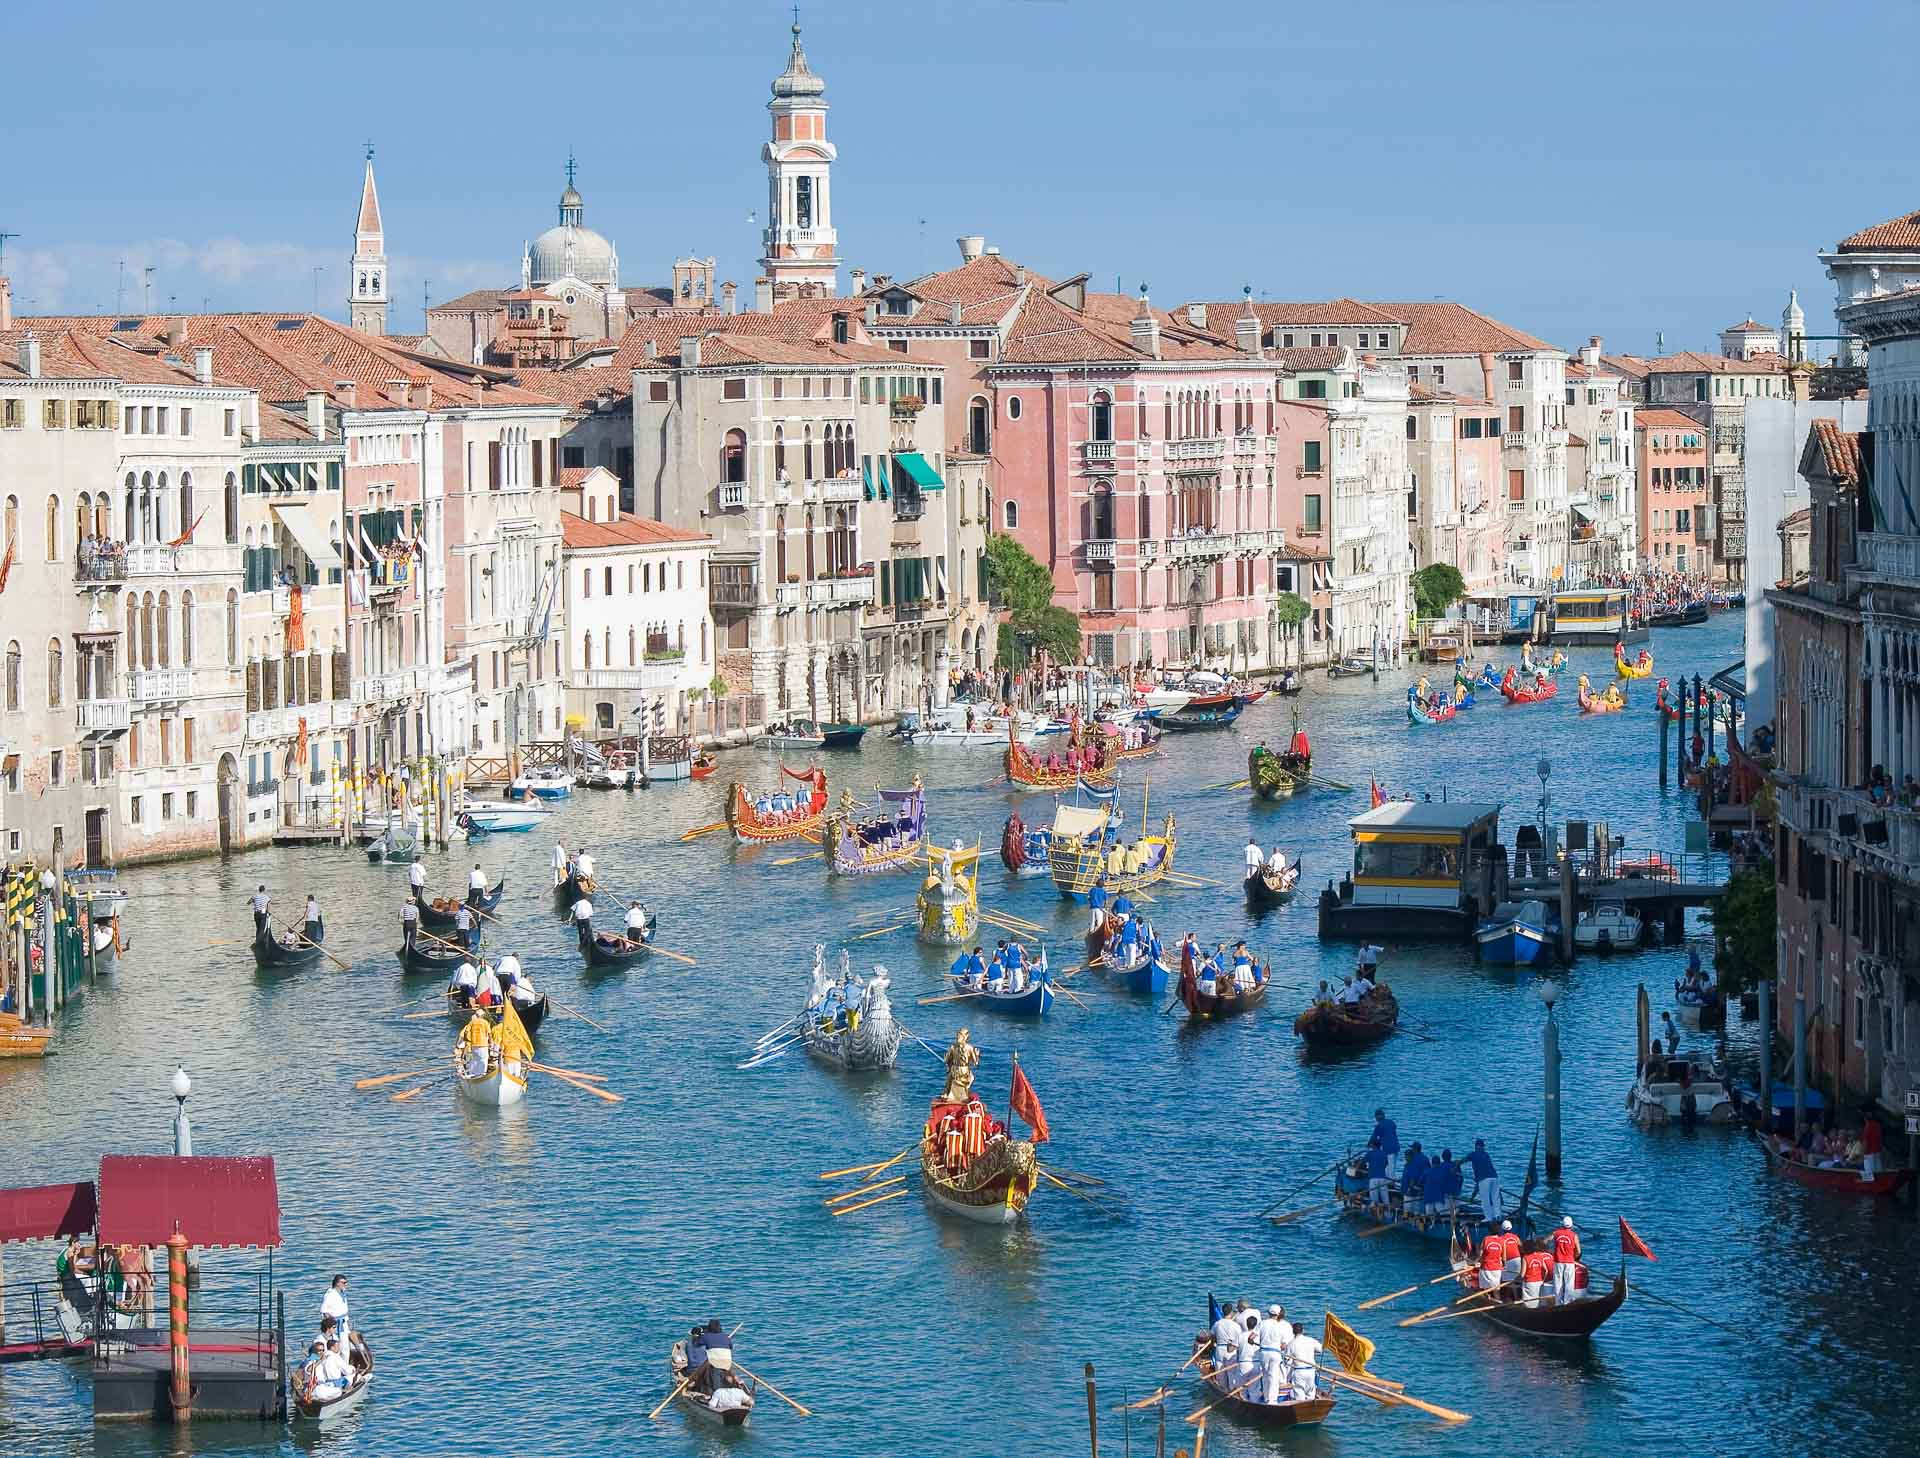 Venise- Luxpérience Eluxtravel - La Regata Storica